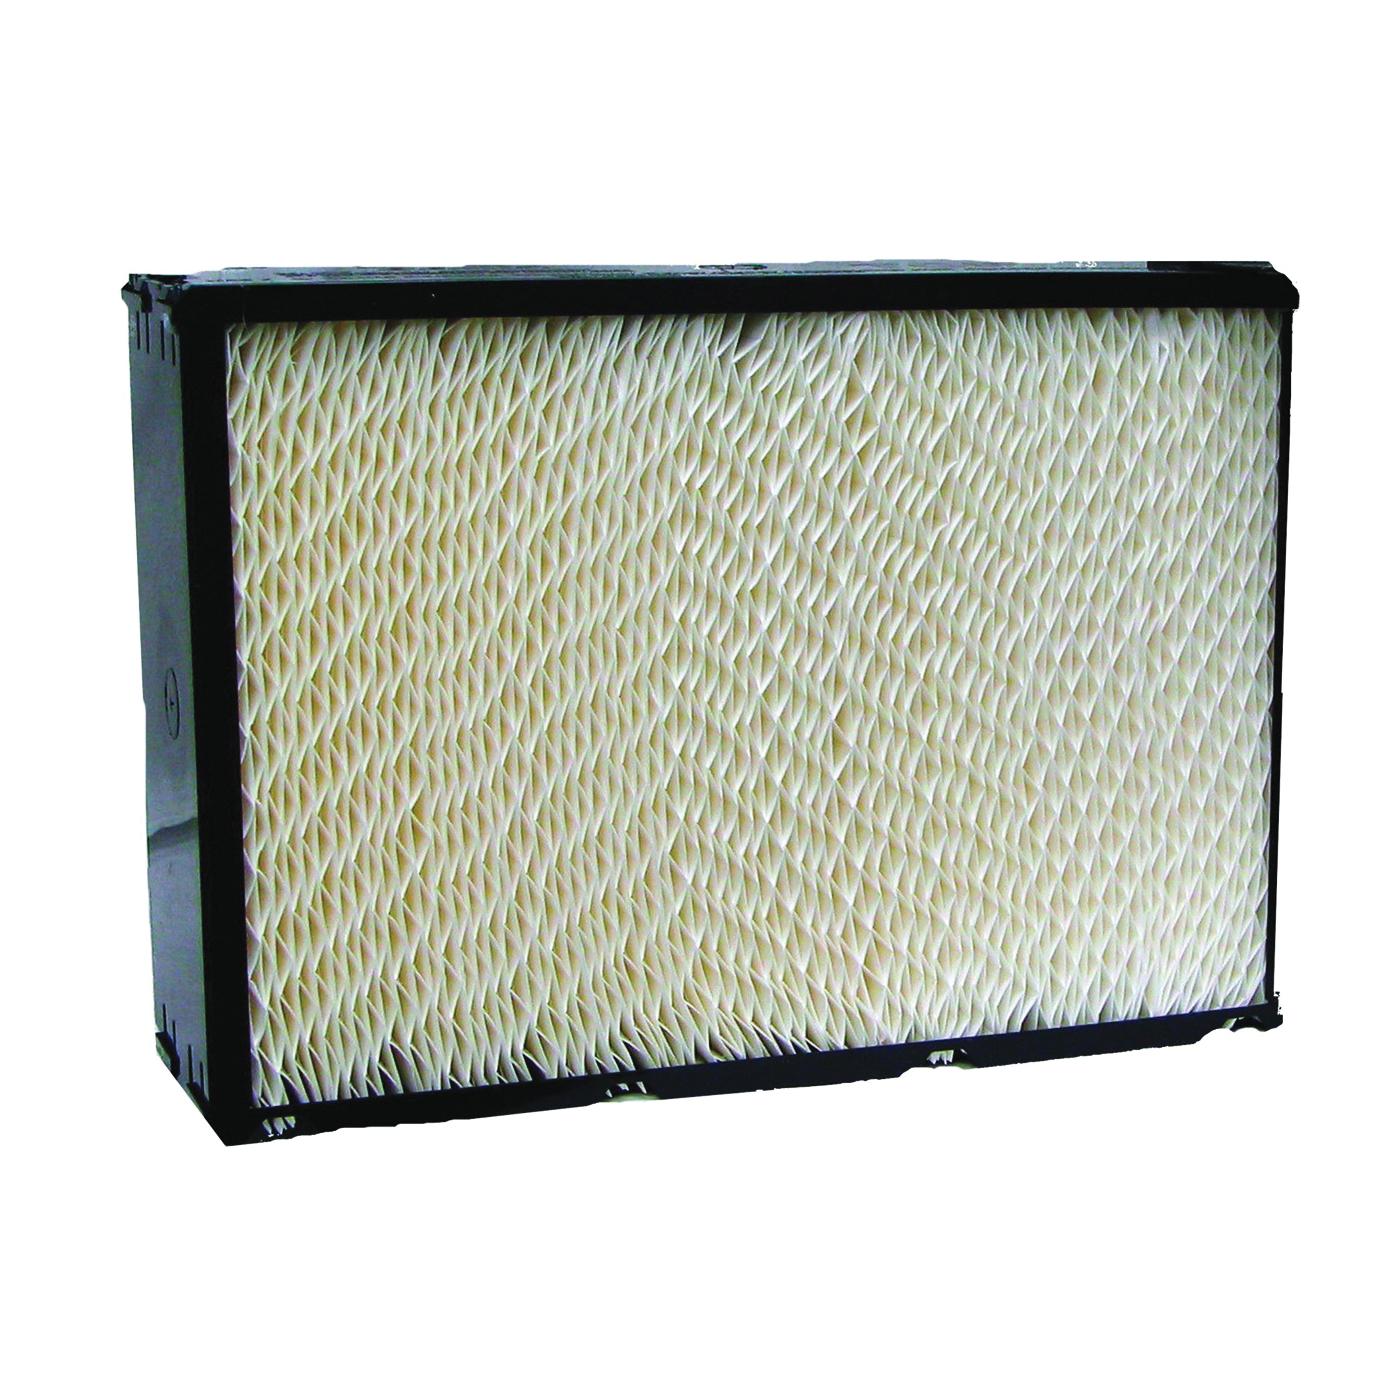 Picture of EssickAir 1045 Wick Filter, 16-3/4 in L, 4-1/2 in W, Plastic Frame, White